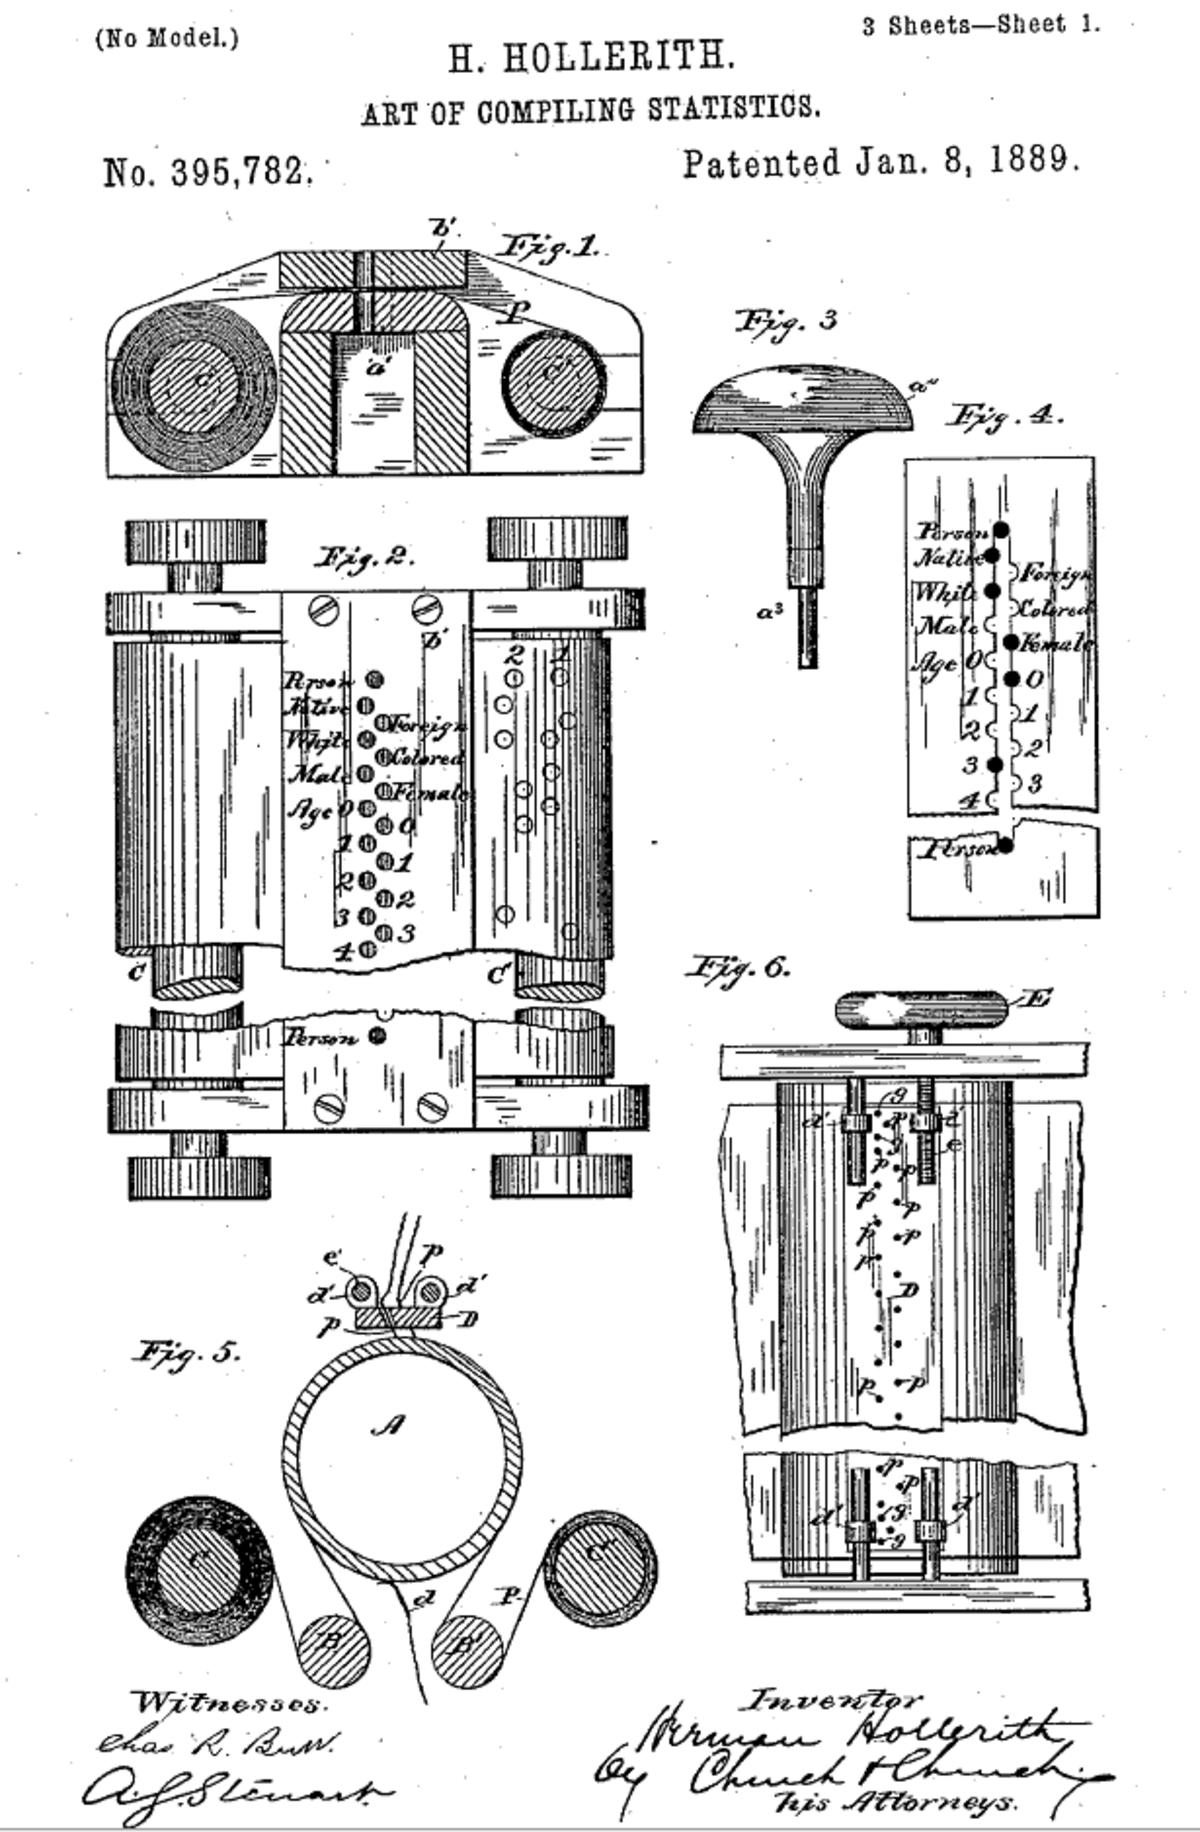 Unit Record Equipment